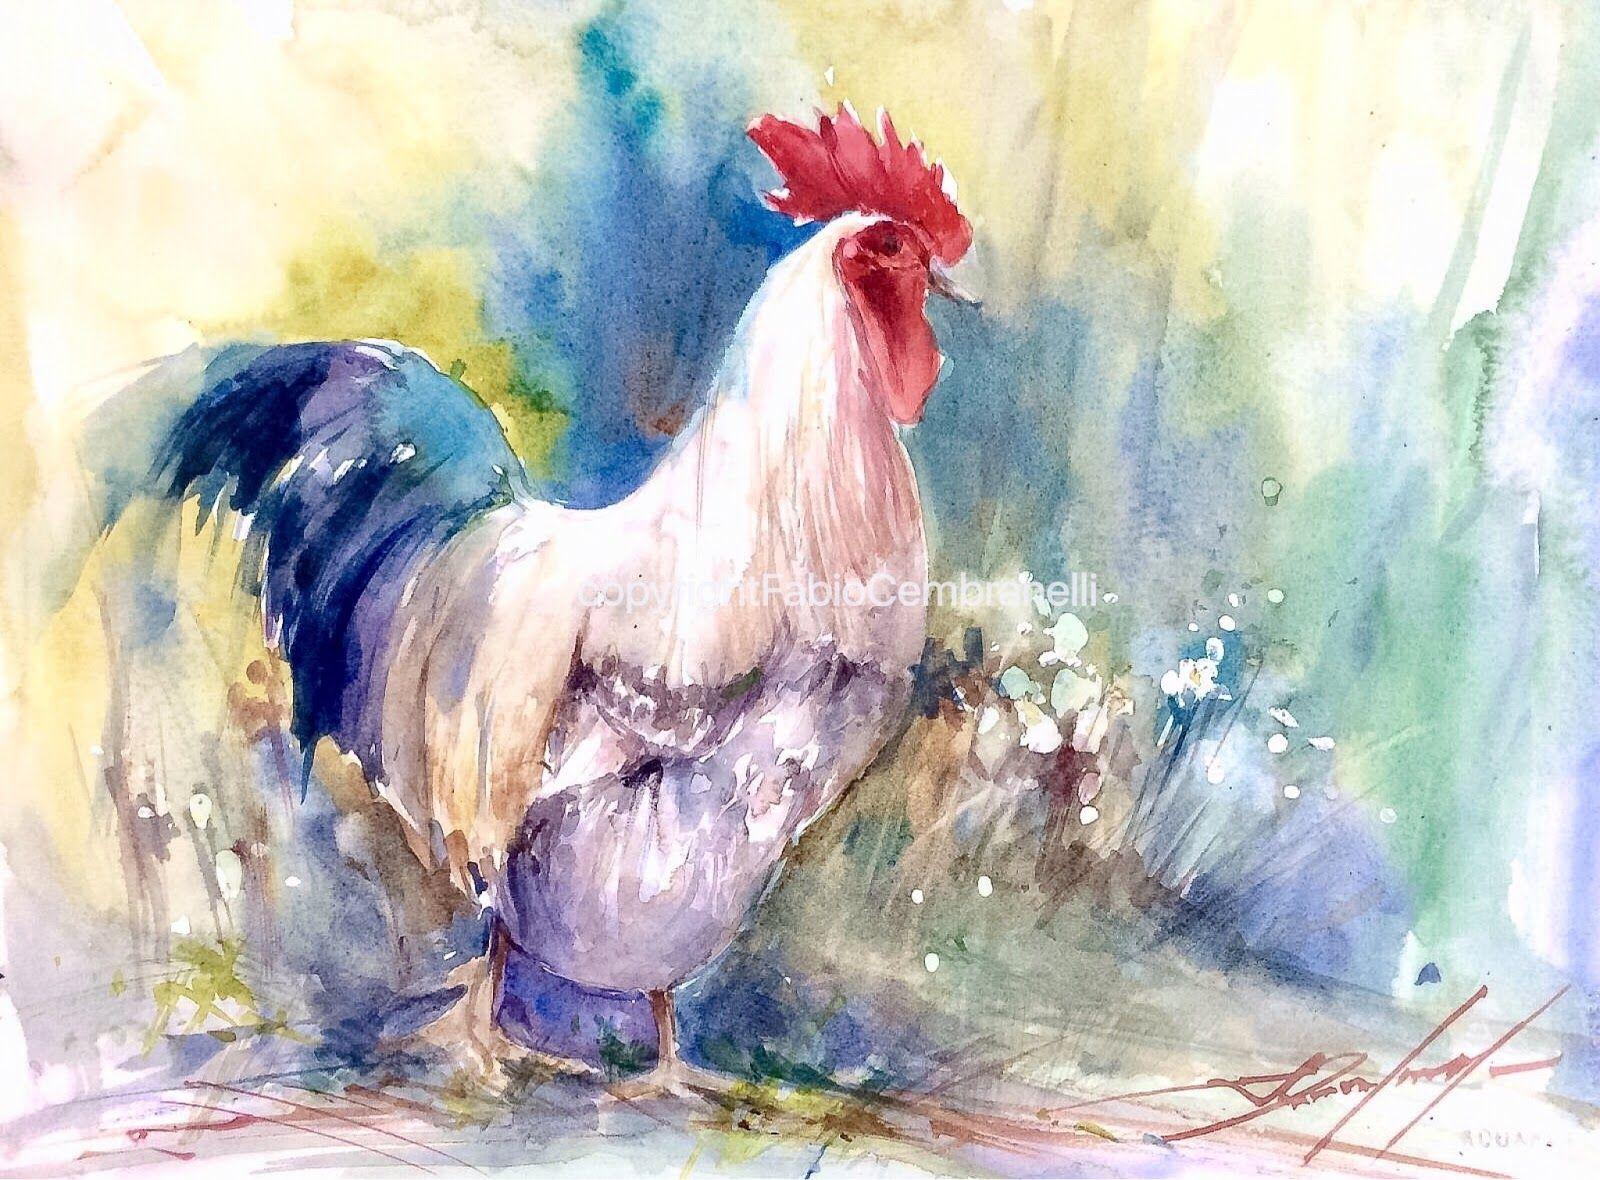 Watercolors Oils And Acrylics By Brazilian Artist Fabio